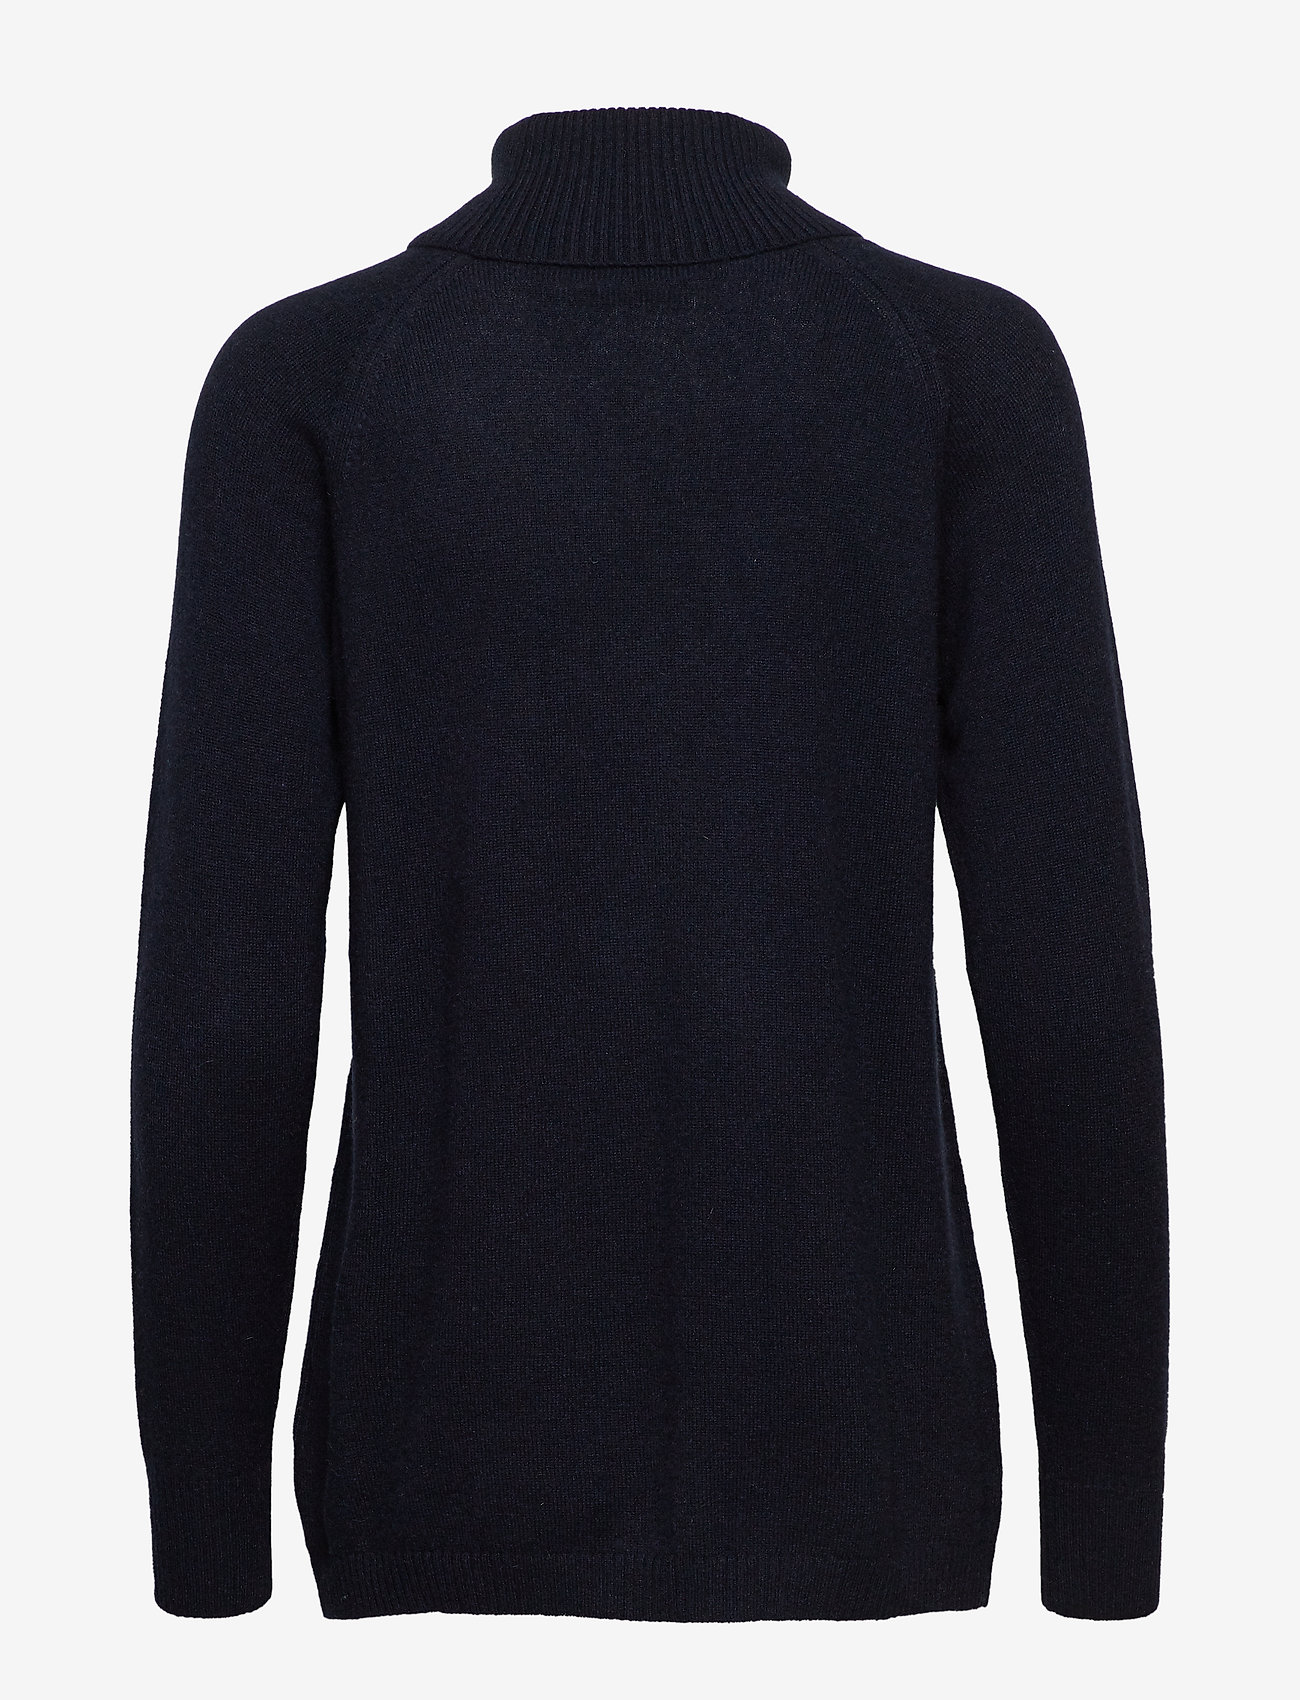 Raglan Turtleneck Loose Sweater  - Davida Cashmere